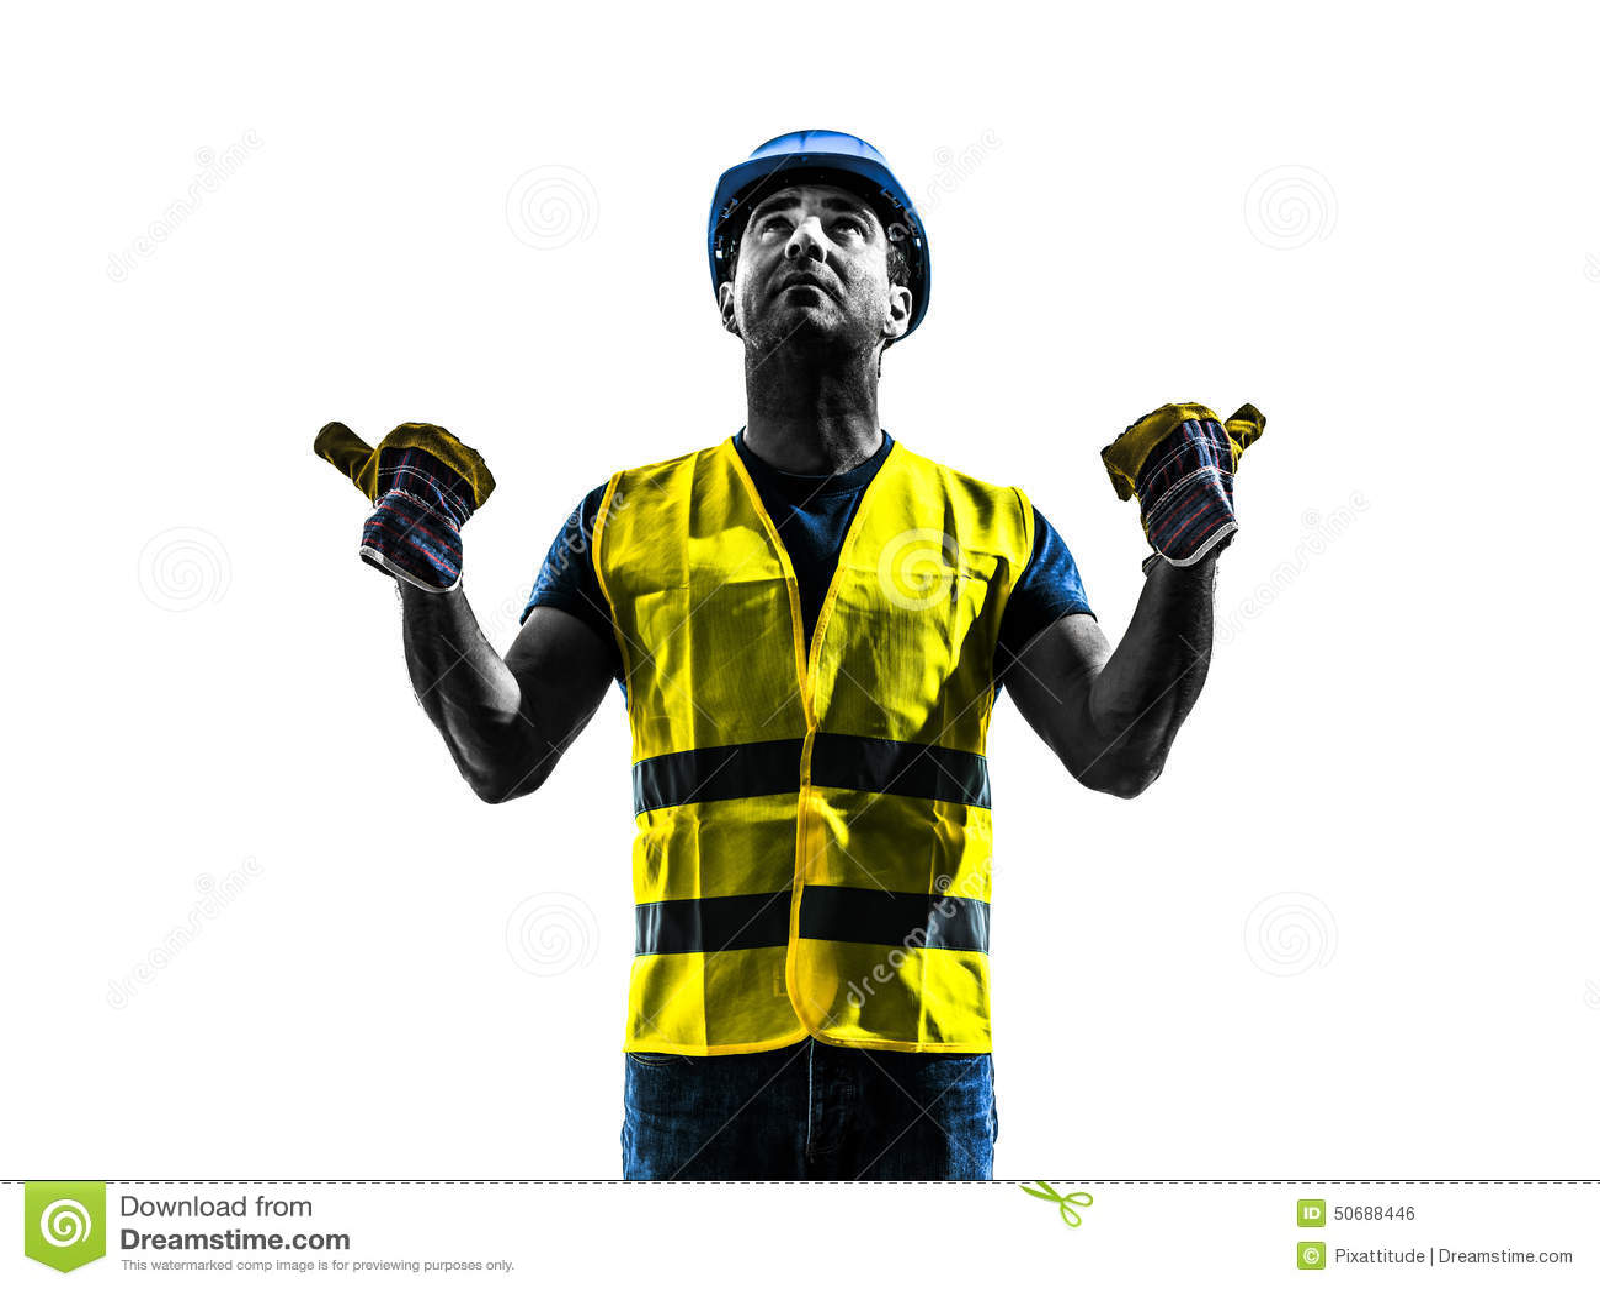 Download 建筑工人信号安全背心延伸景气剪影 库存照片. 图片 包括有 影子, 回旋, 信号, 陈列, 手工, 夹克 - 50688446